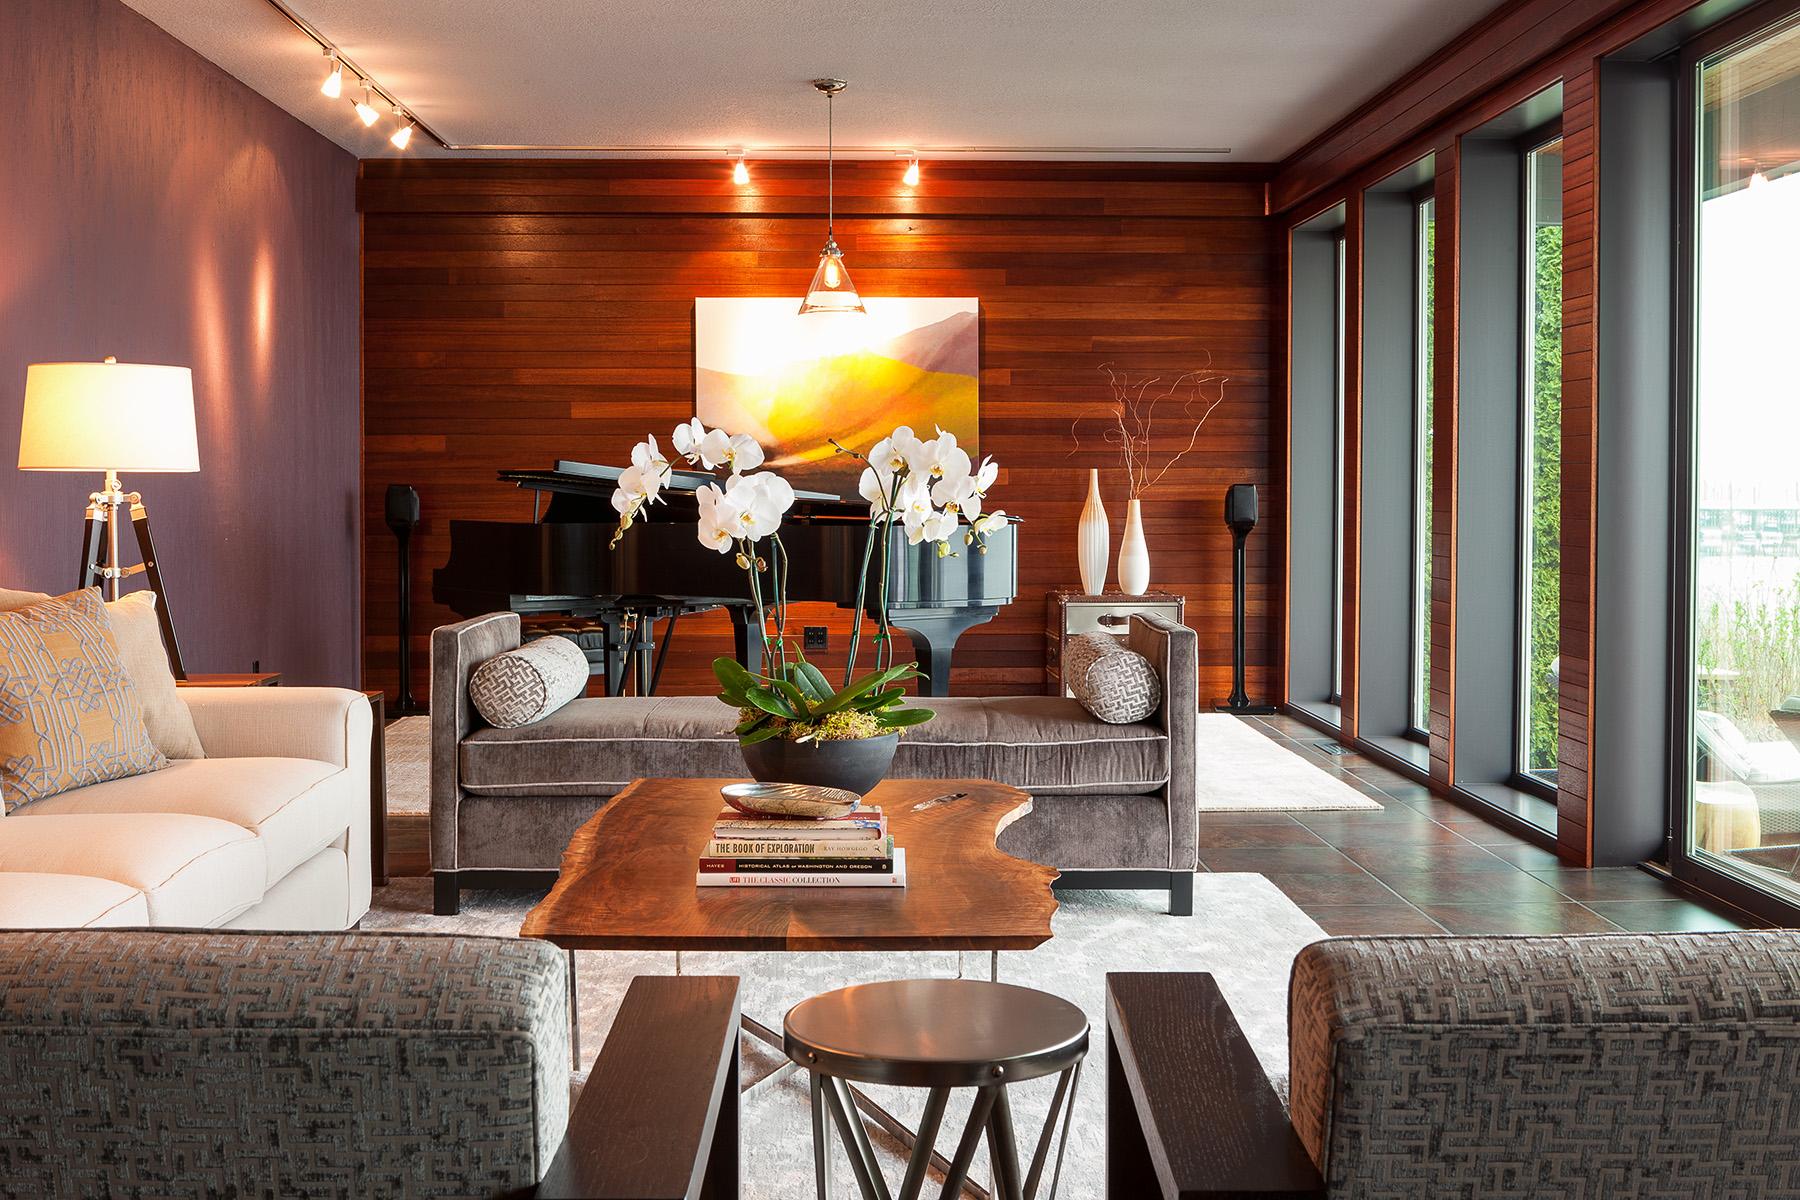 Interior Design And Construction Vancouver Wa